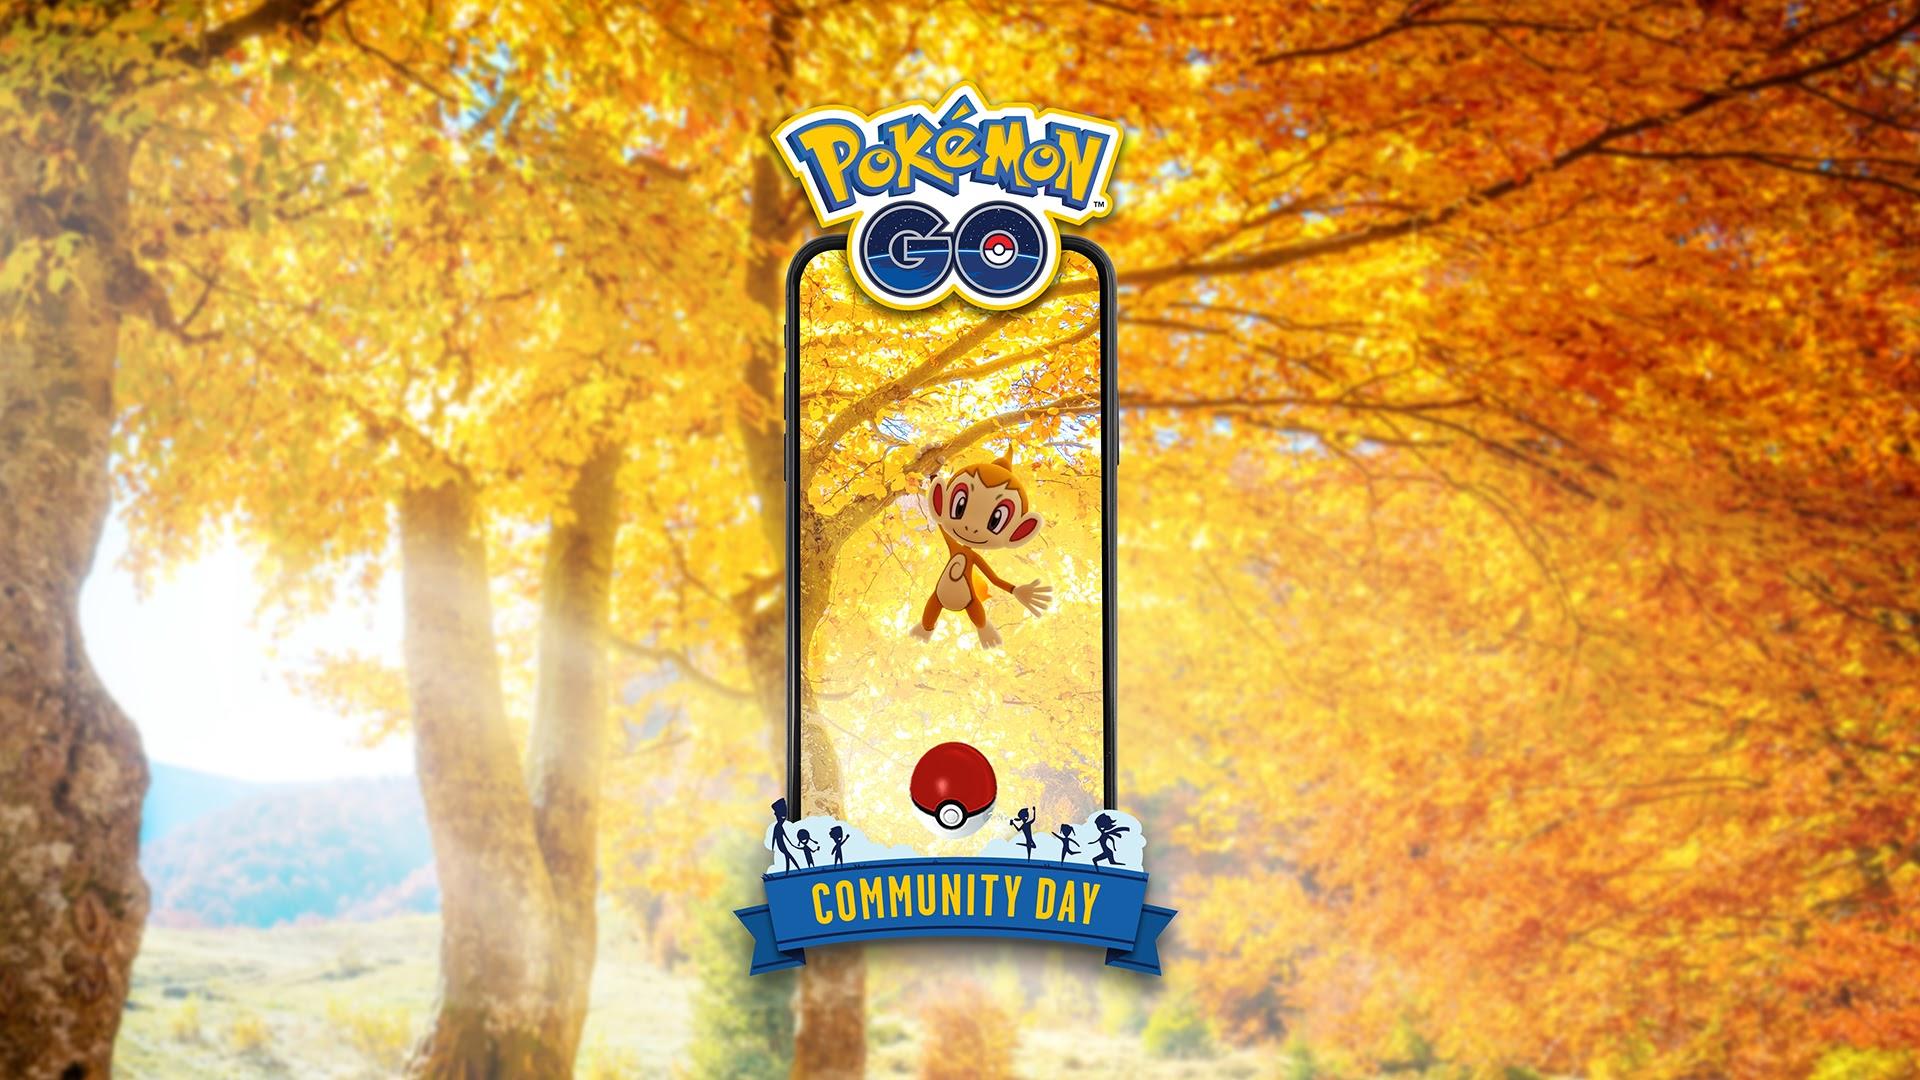 November's Pokémon Go Community Day focuses on Chimchar